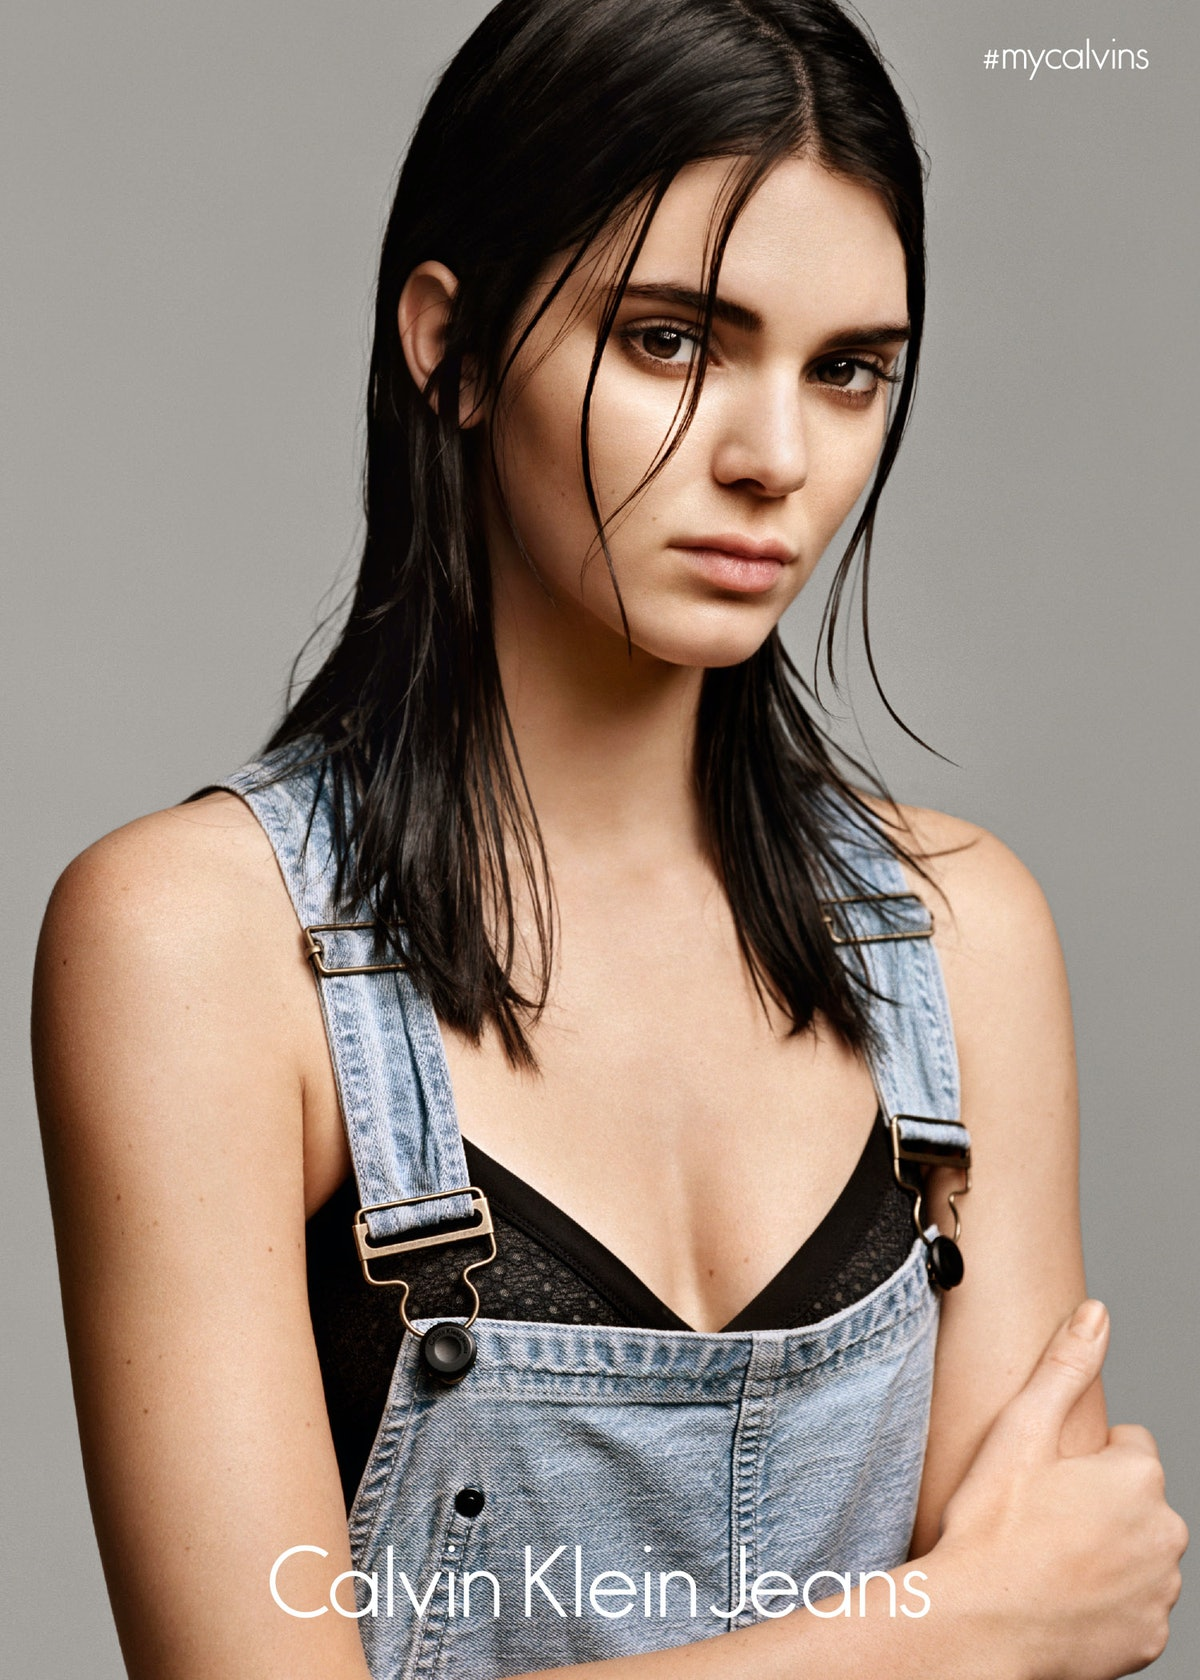 Kendall Jenner for Calvin Klein Jeans